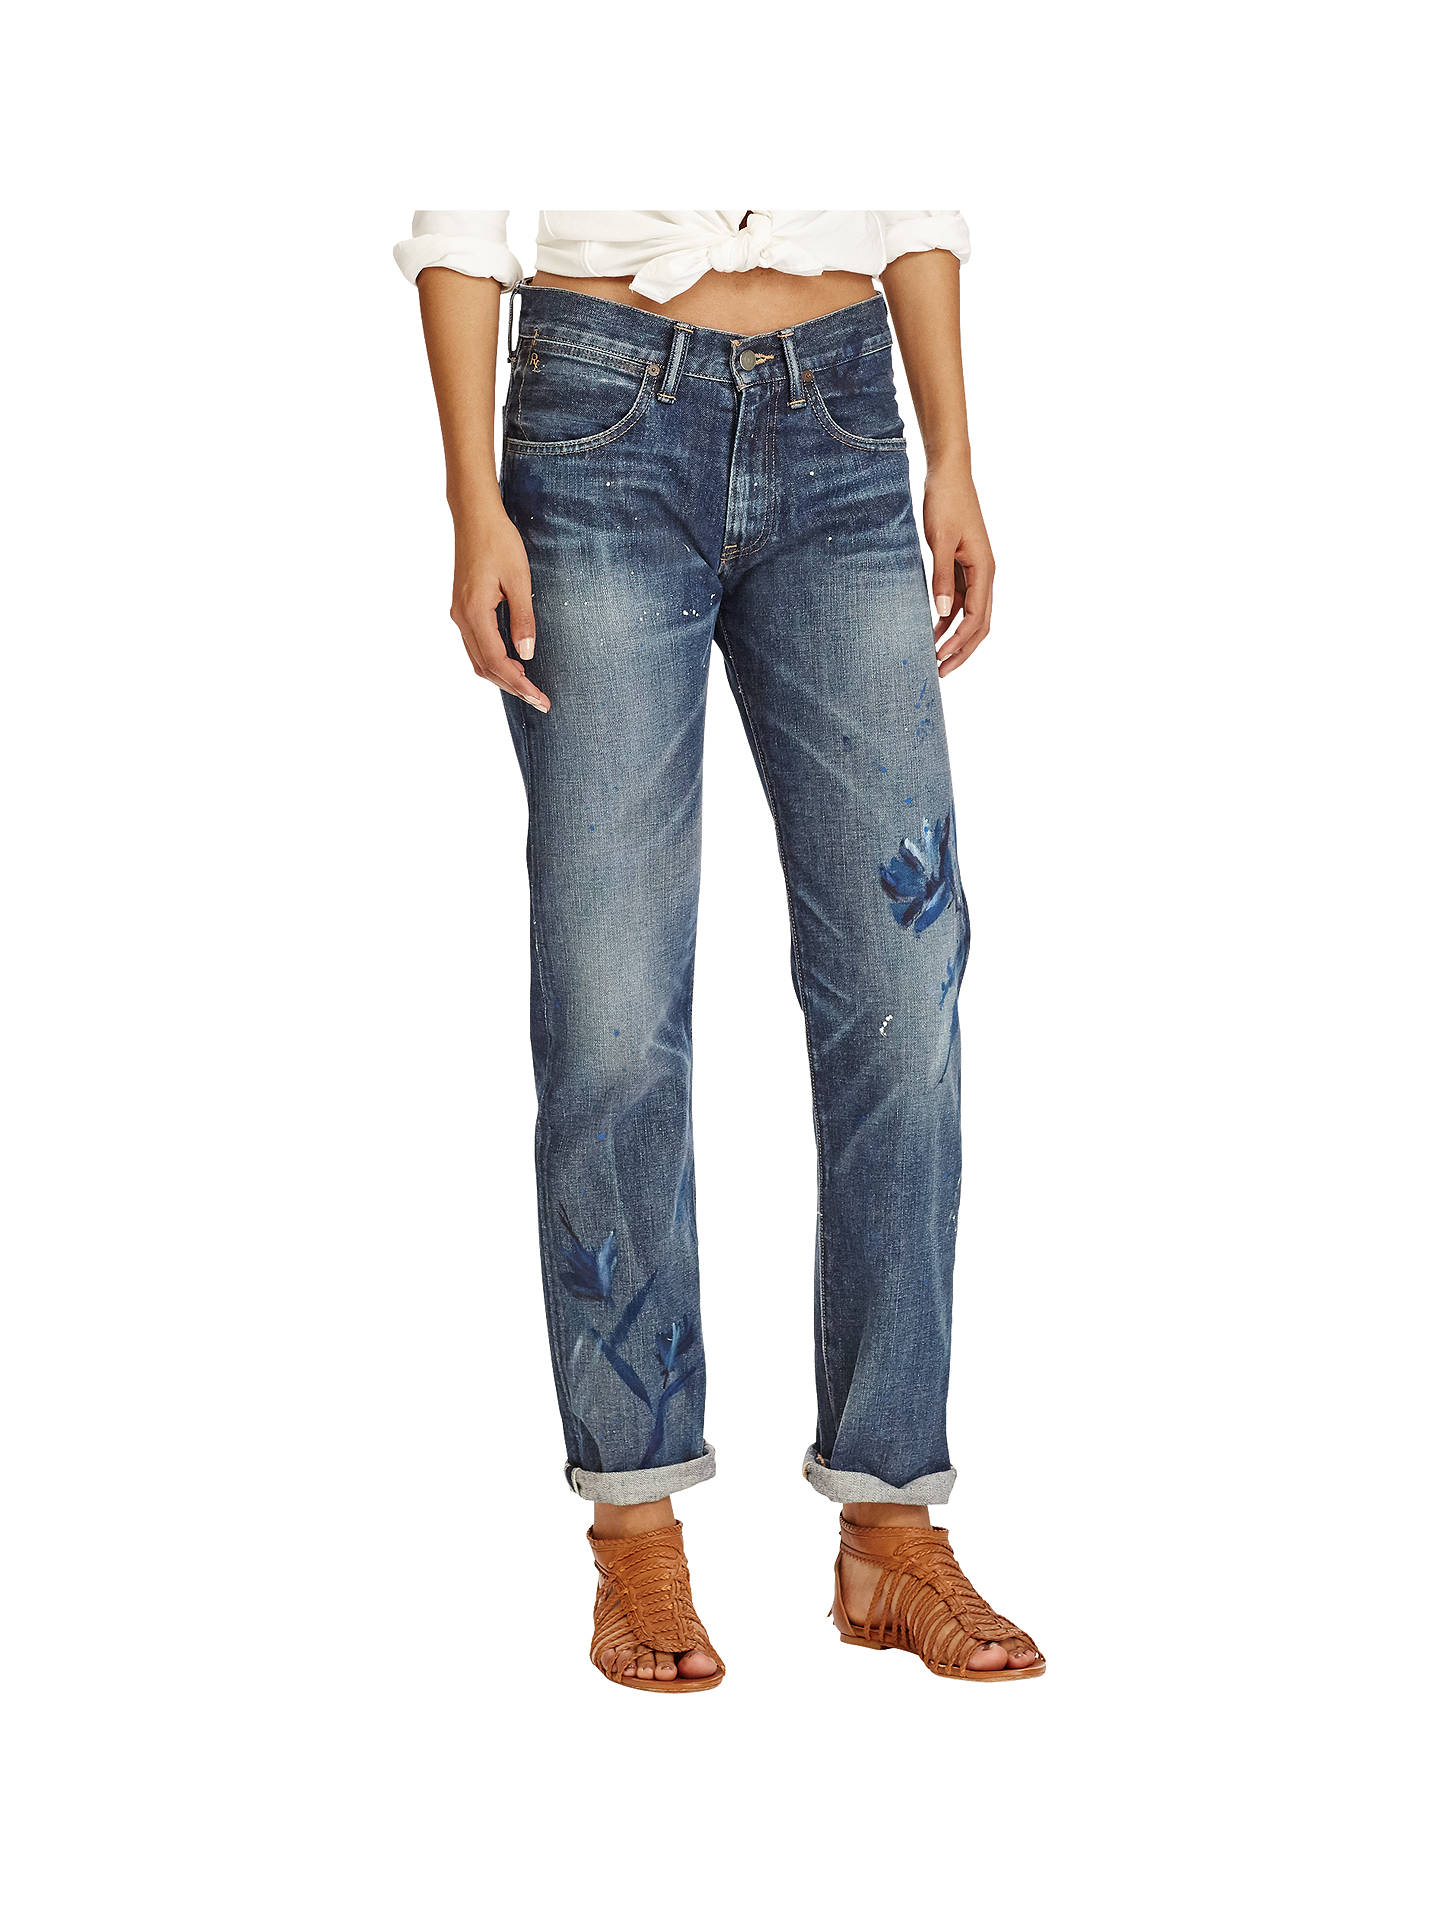 adcf94aa0 Buy Polo Ralph Lauren Astor Slim Boyfriend Jeans